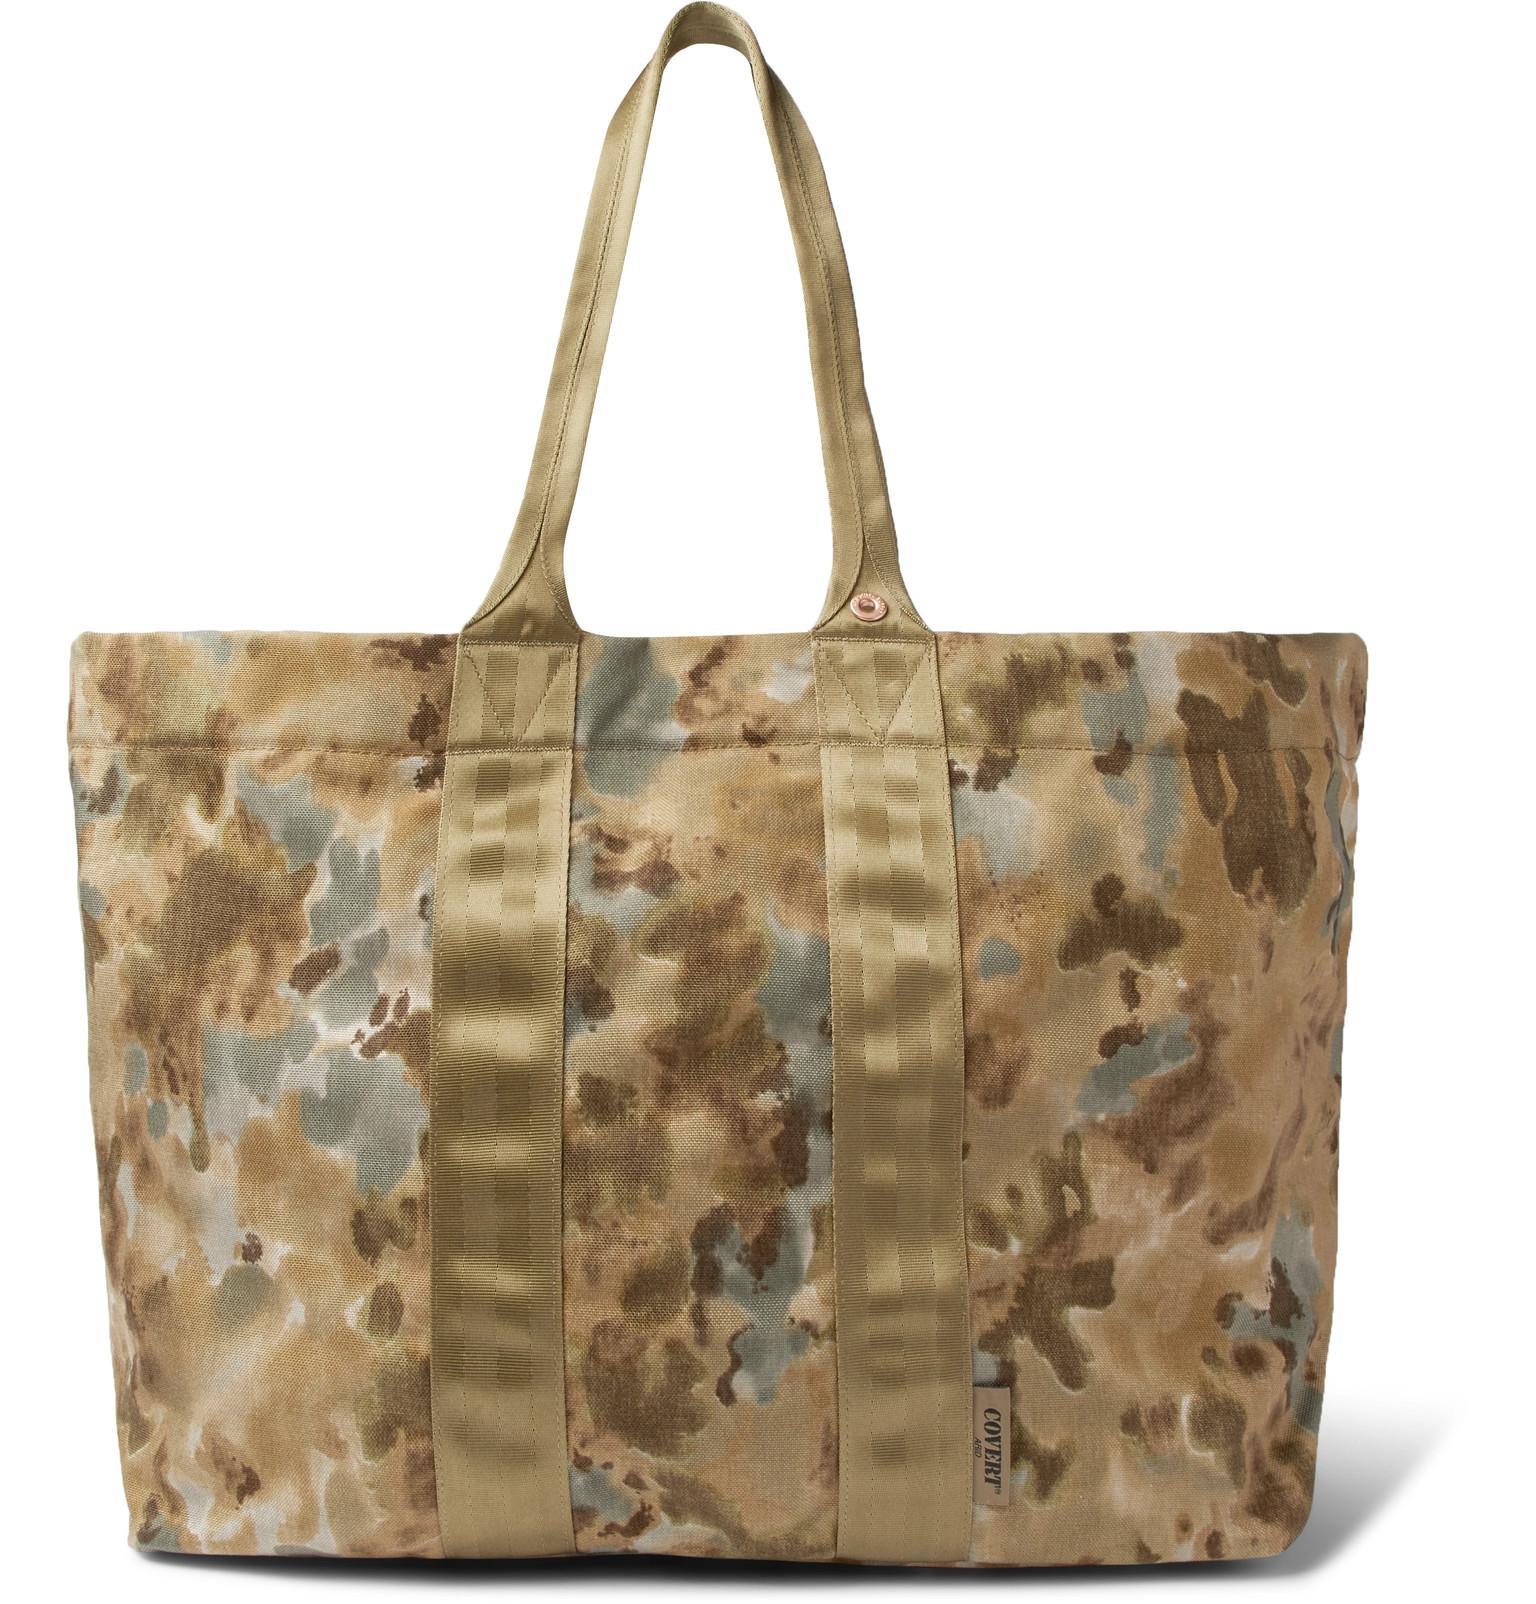 Herschel H-445 Camouflage Tuff Stuff Tote Bag - Green 2uoklKSZ